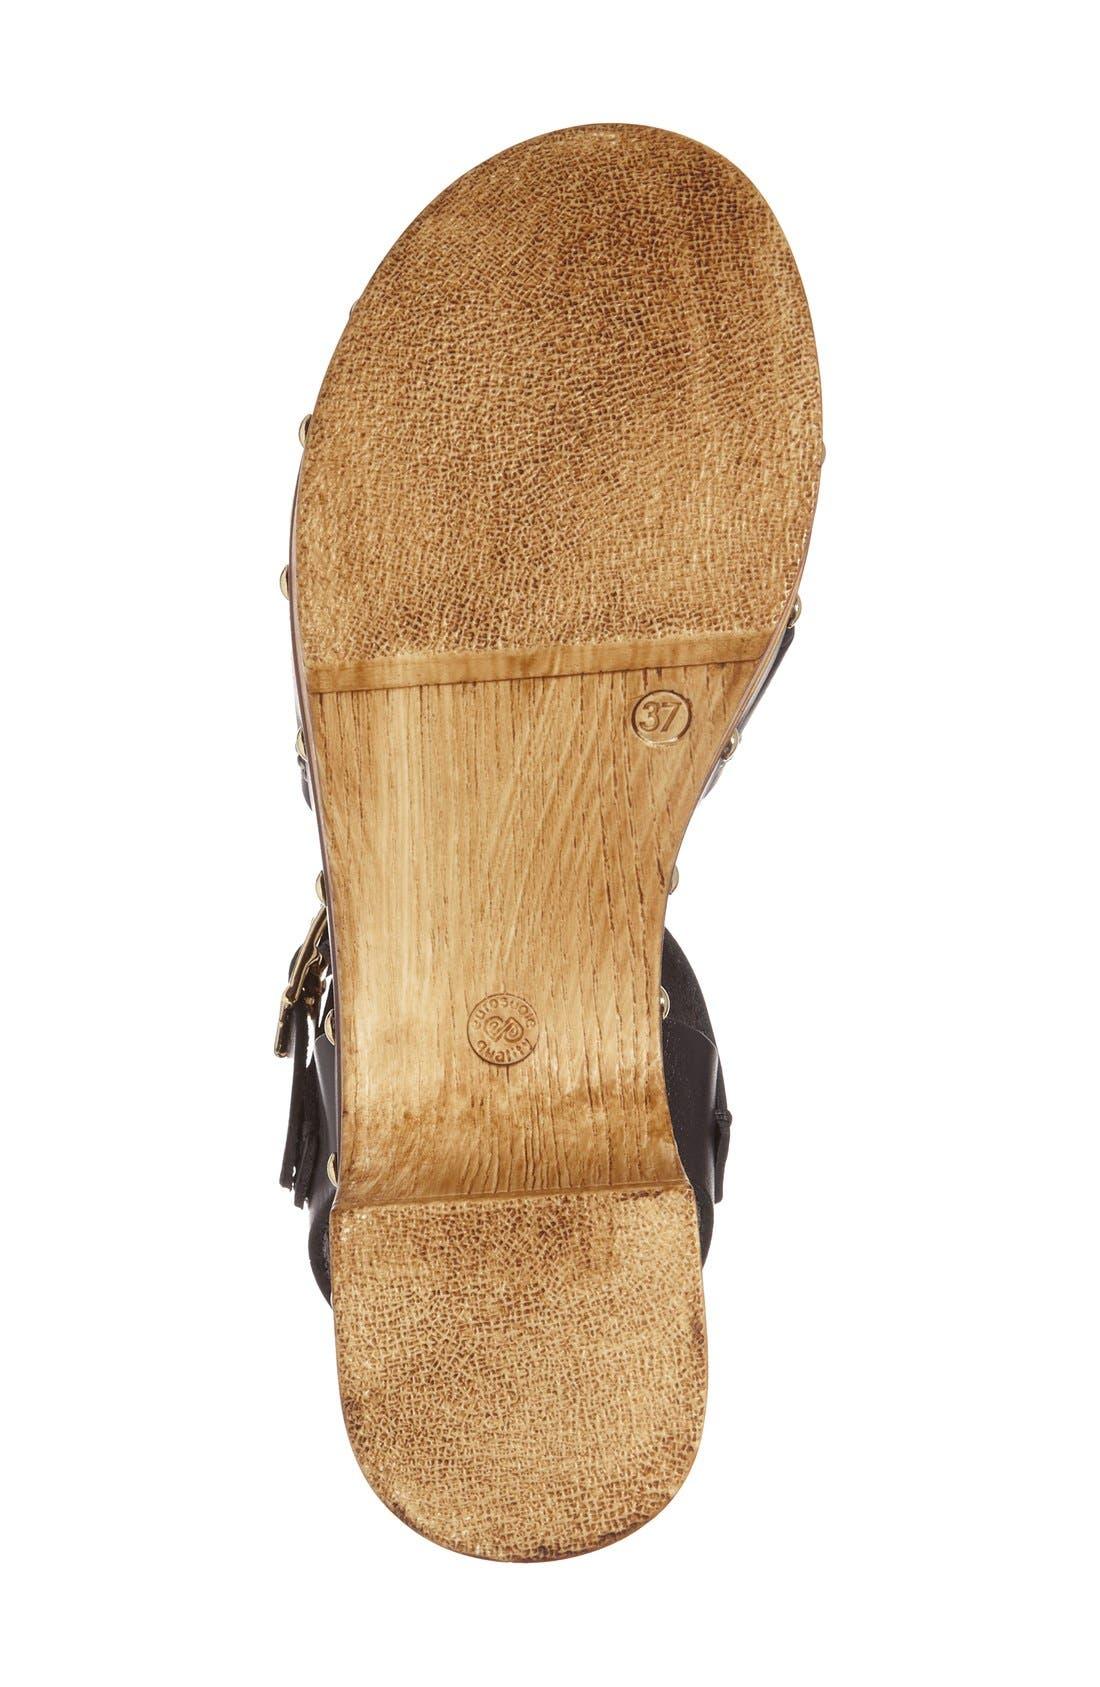 'VIV' Clog Sandals,                             Alternate thumbnail 4, color,                             Black